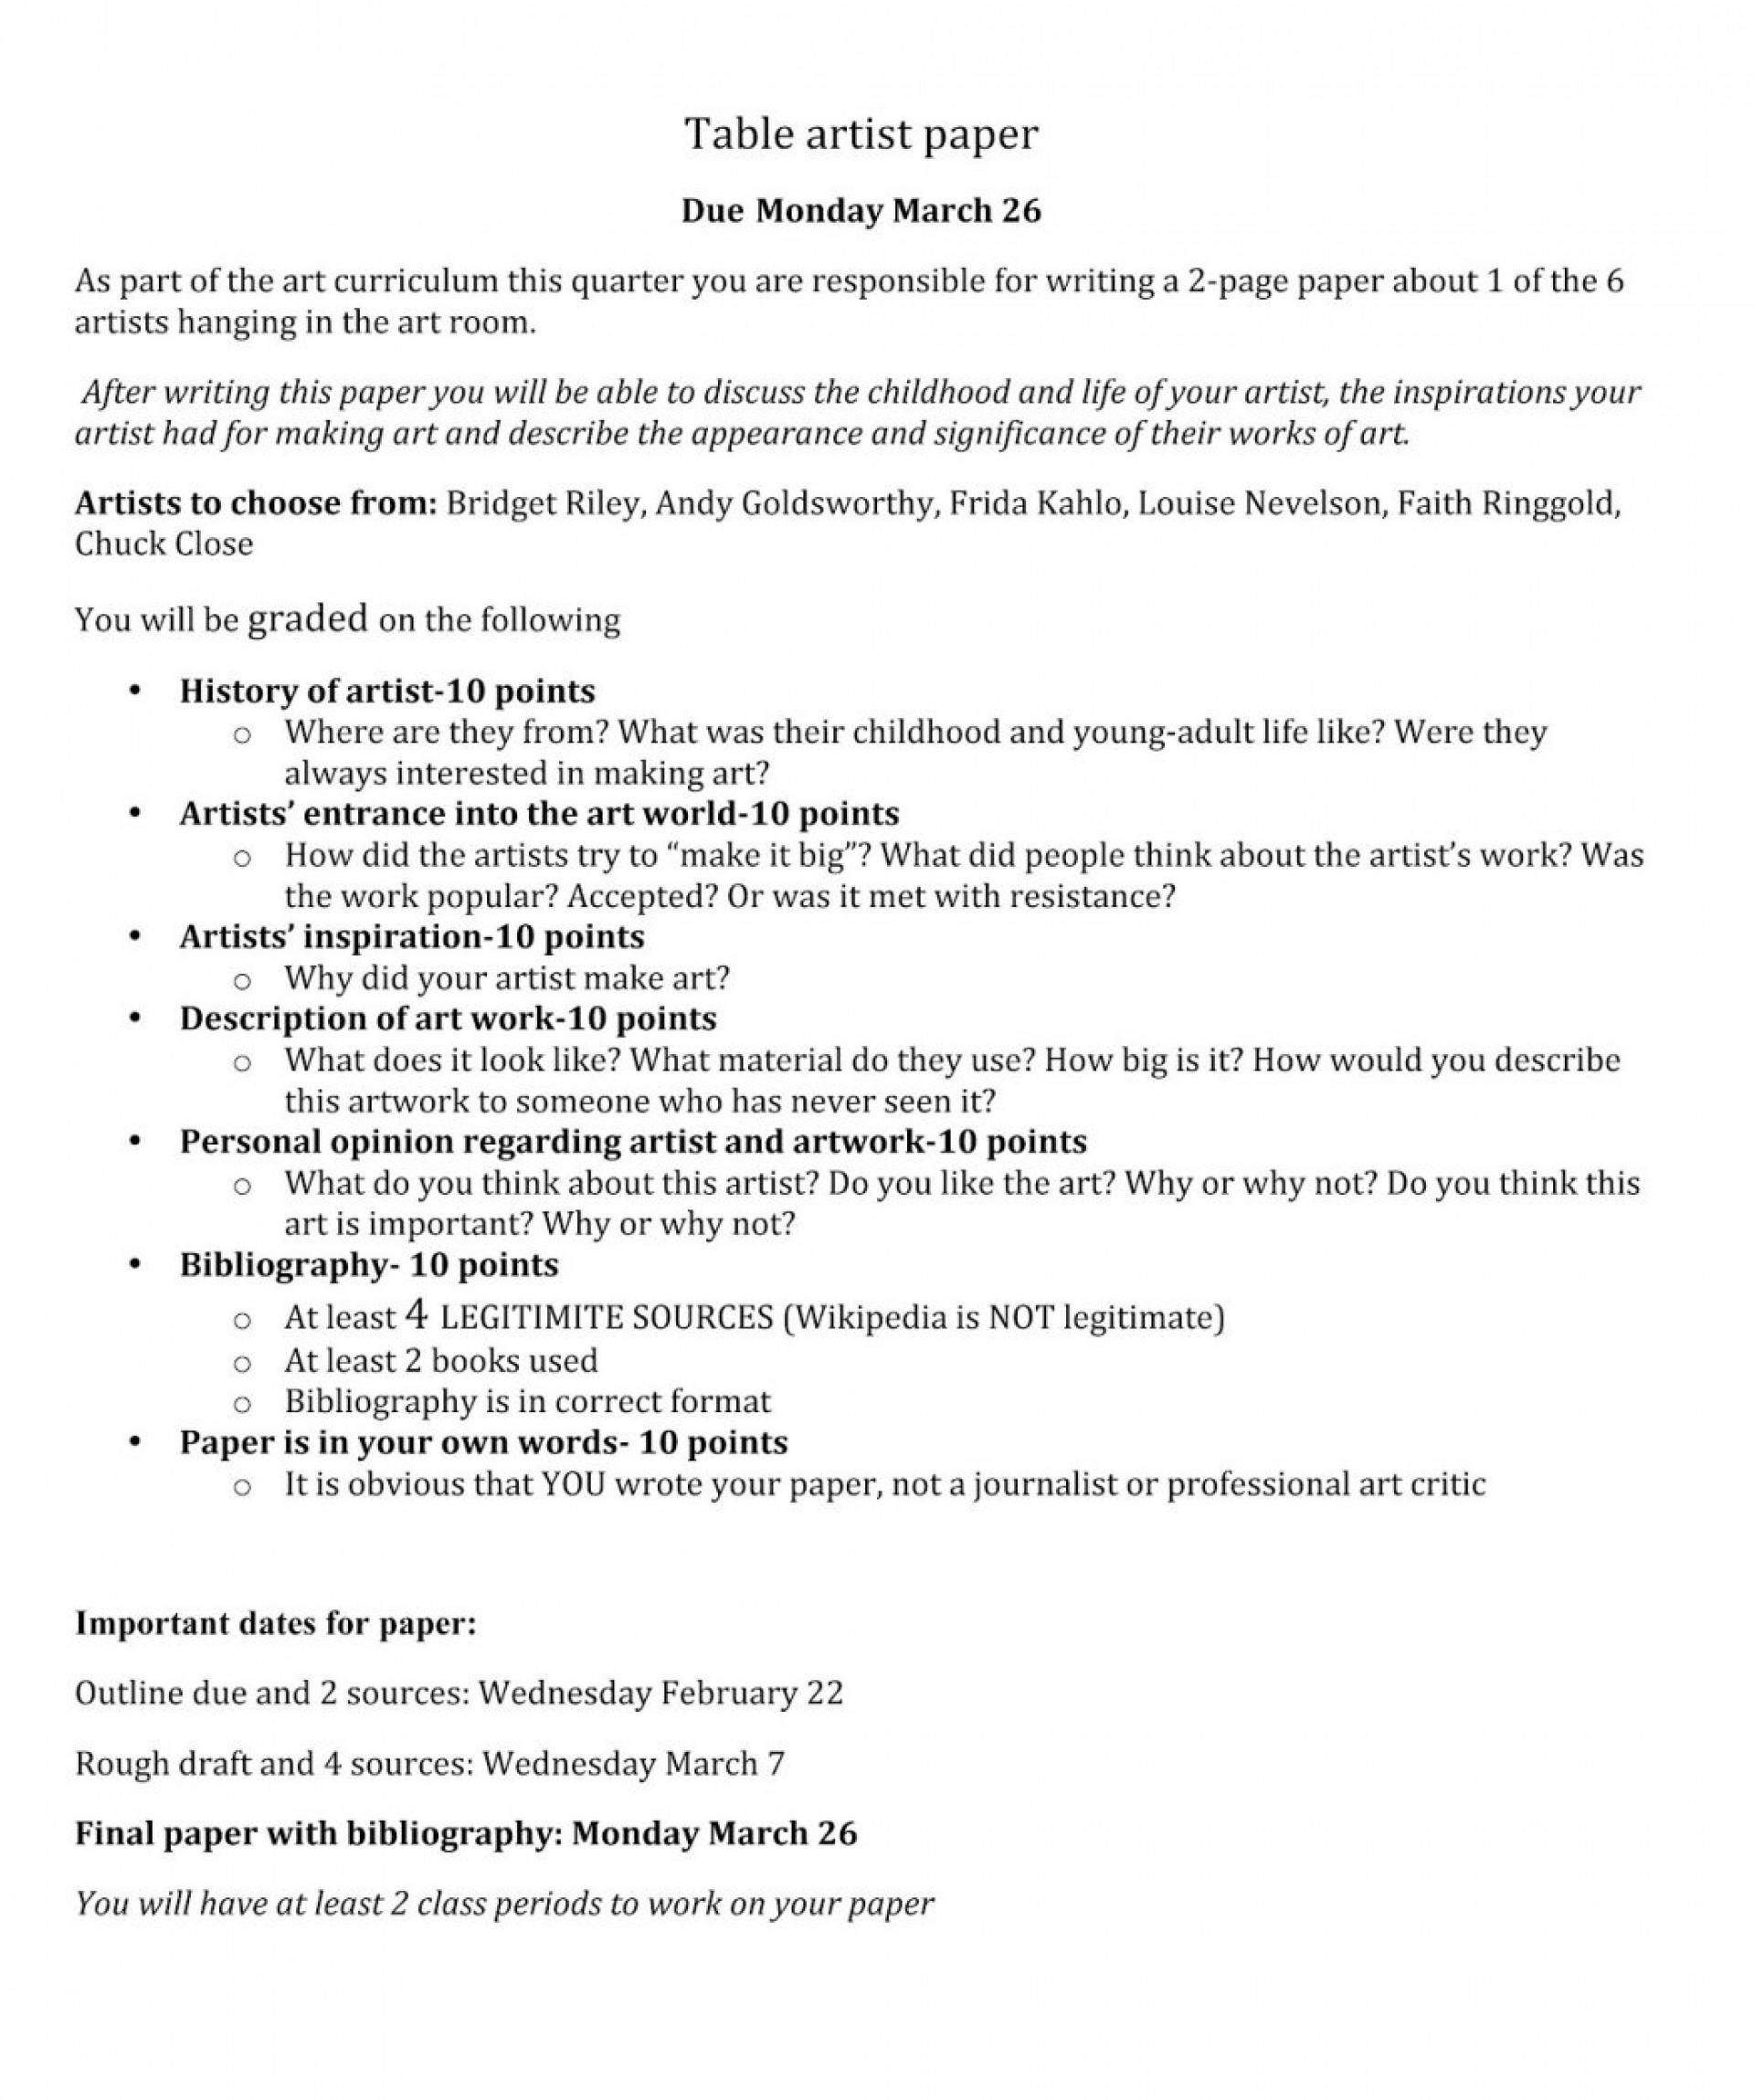 013 Art Essays College Papi Ip Hi History Metropolitan Museum Of Application Performing Arts School Culinary Liberal Martial 1048x1255 Formidable Essay Examples Conclusion A2 1920